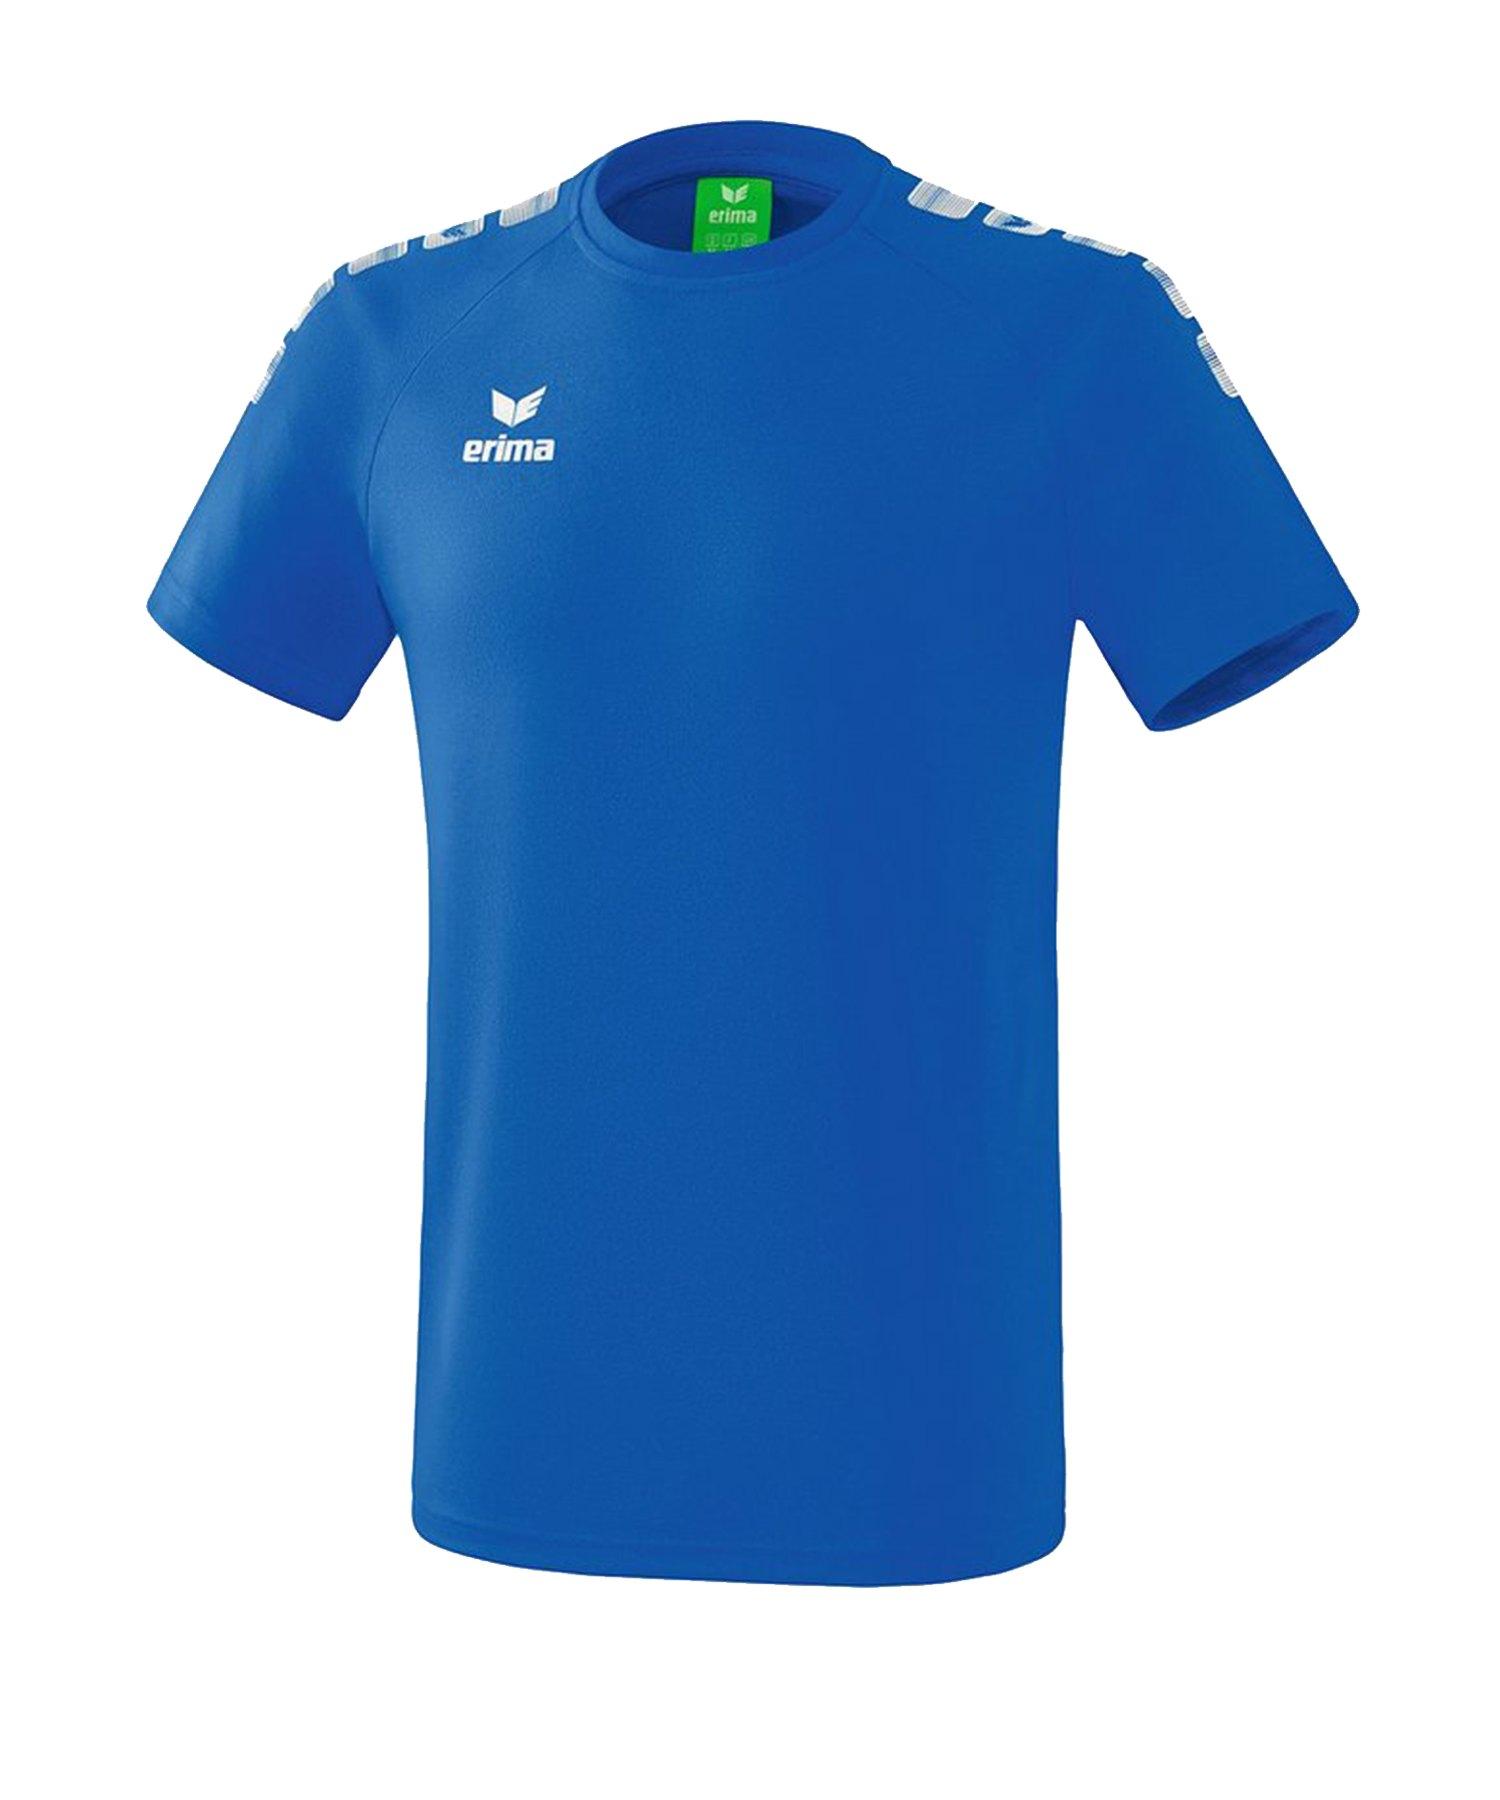 Erima Essential 5-C T-Shirt Kids Blau Weiss - Blau